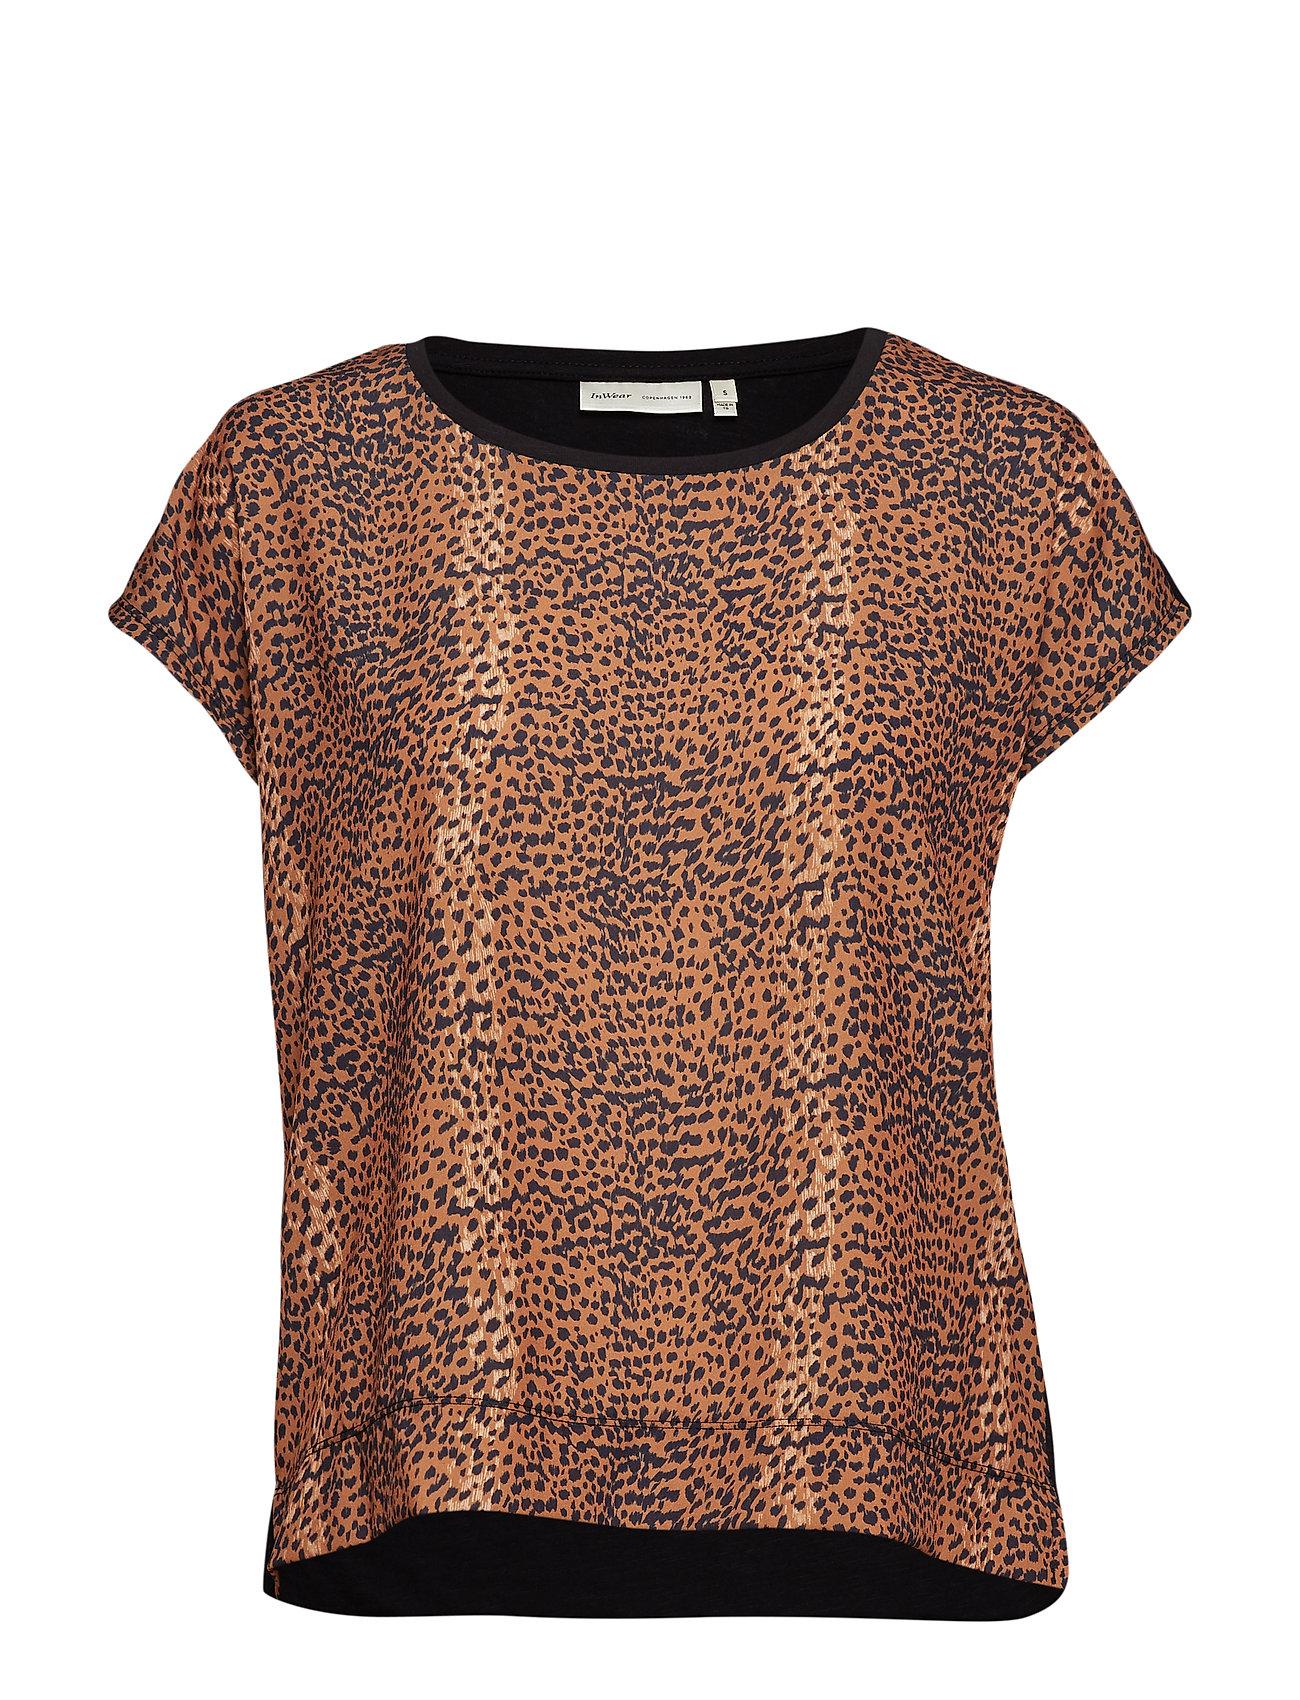 InWear Sicily Tshirt - LIGHT BROWN ANIMAL